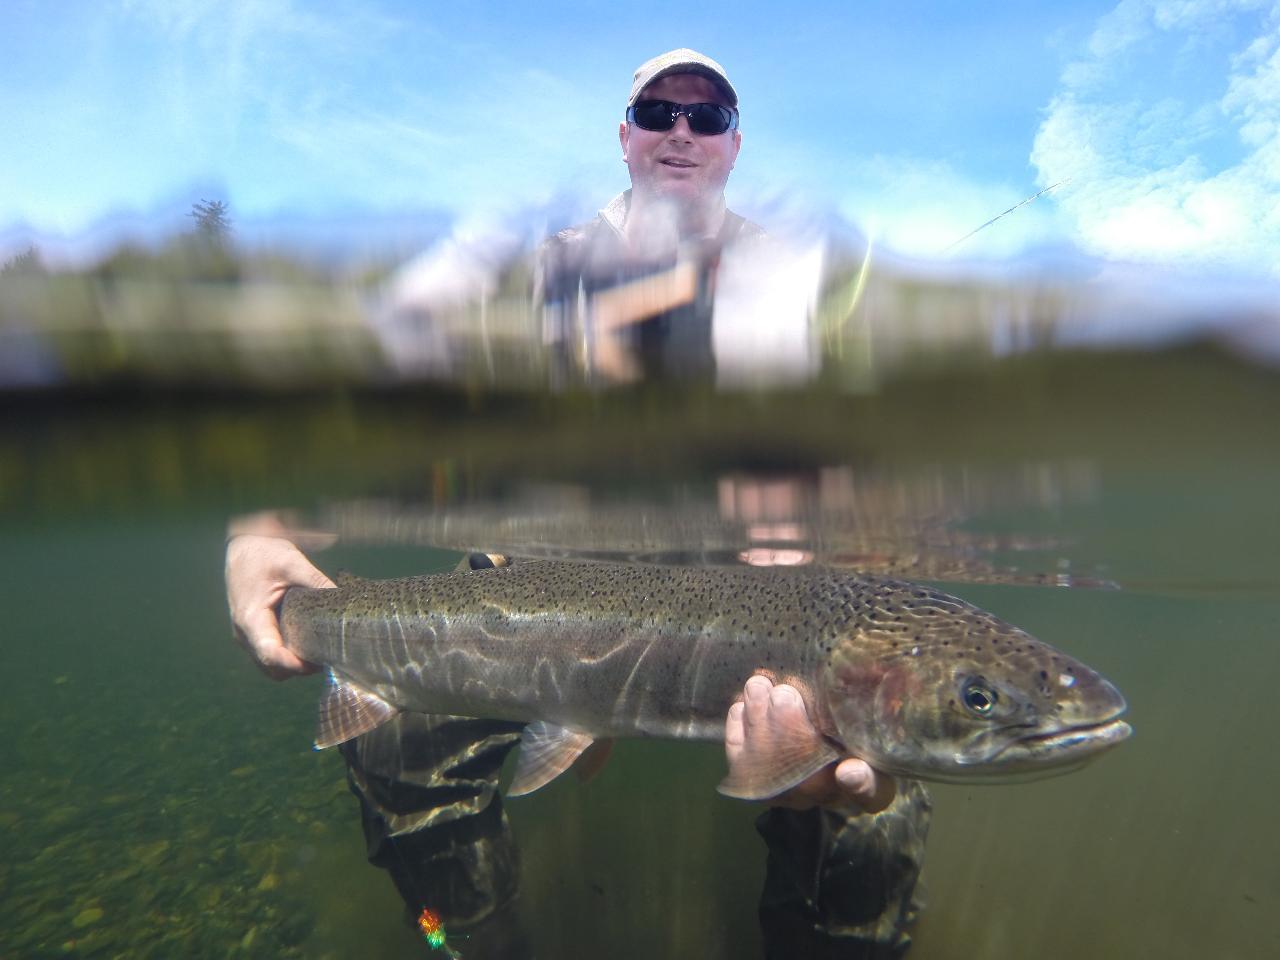 Spring Steelhead 3 days fishing 4 nights lodging all inclusive.